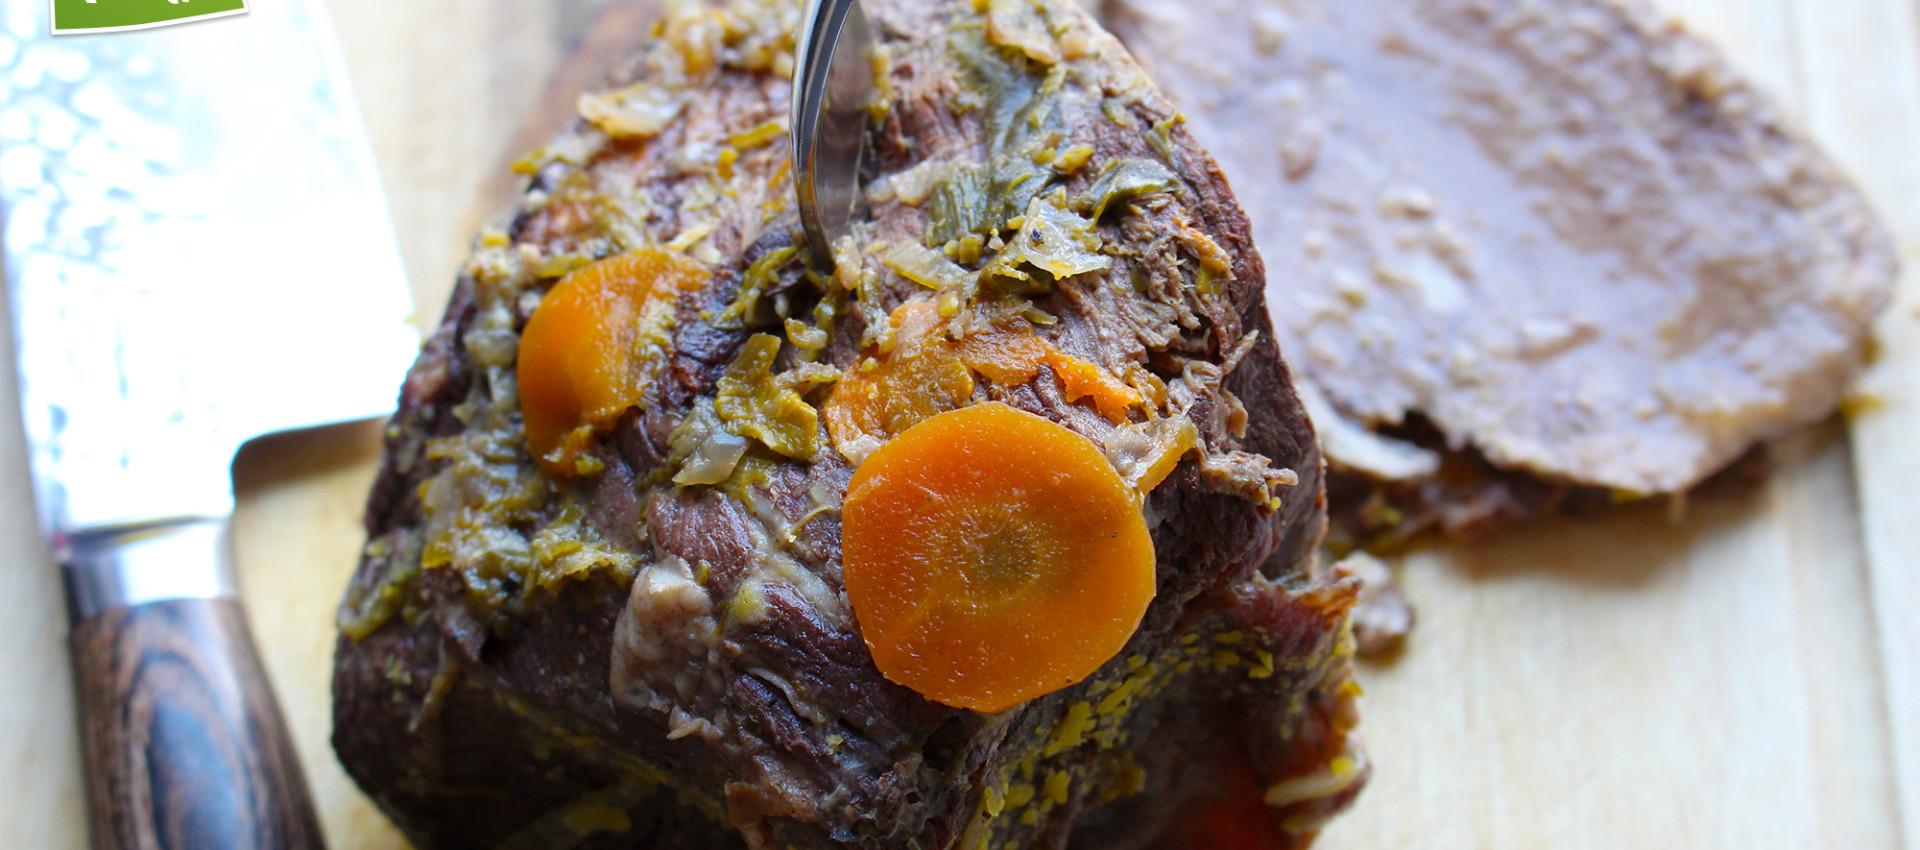 Rezept saftiger Rinderbraten mit Gemüse von Kochbock.de